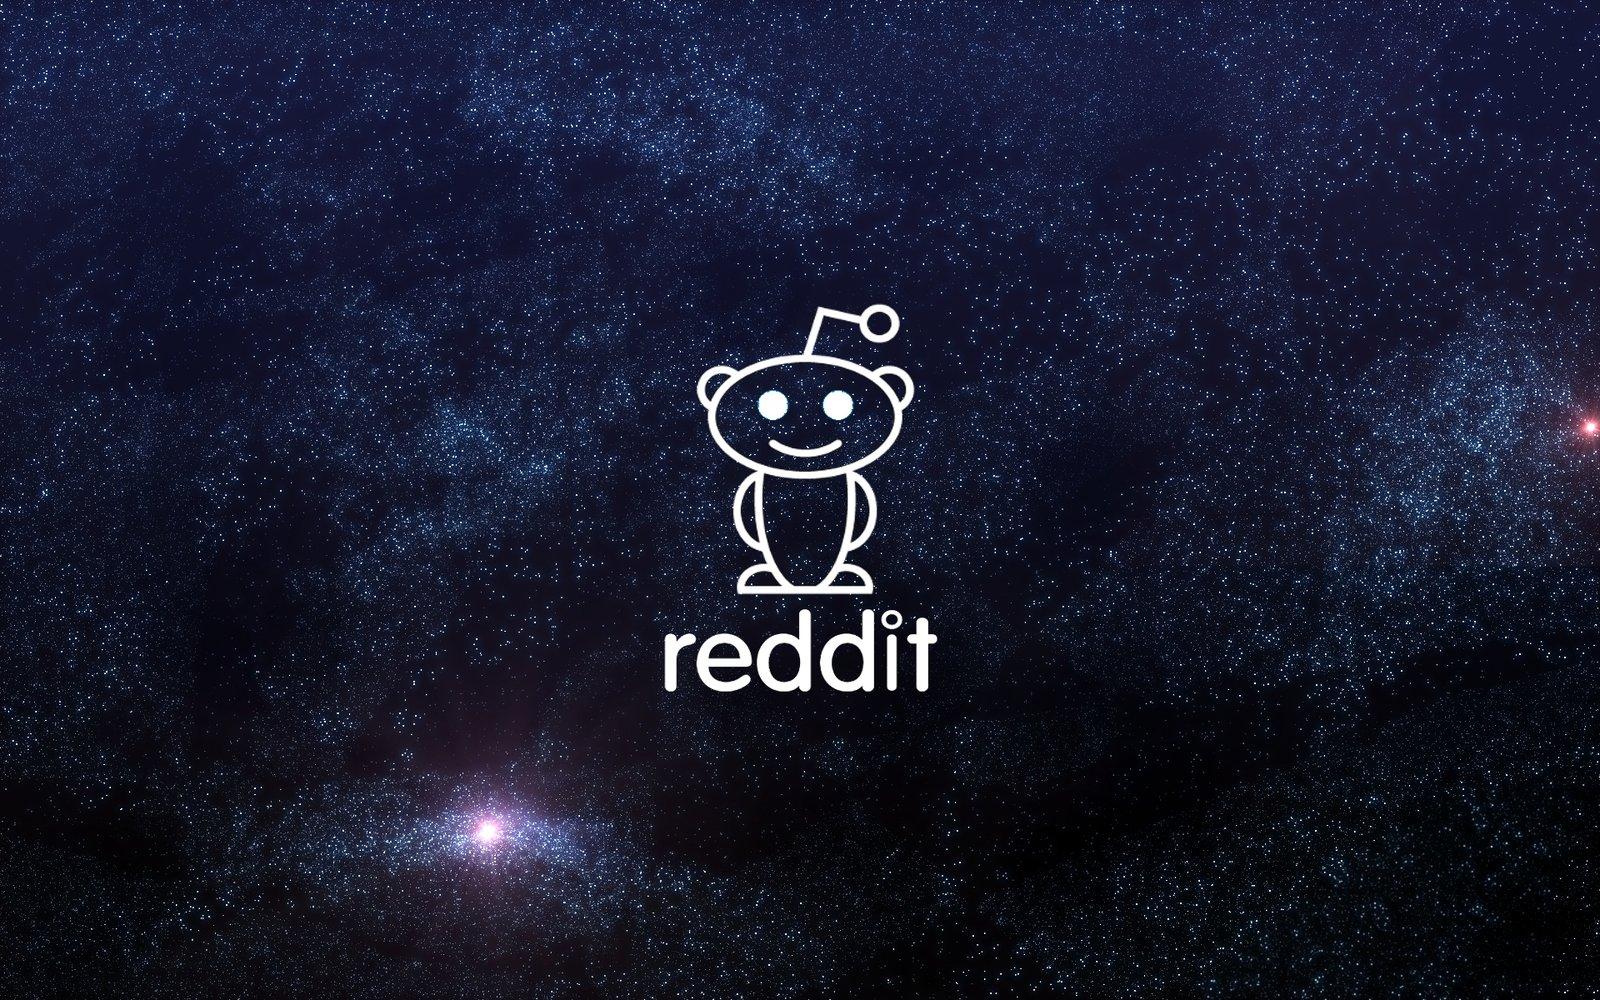 48+] Reddit Space Wallpapers on WallpaperSafari